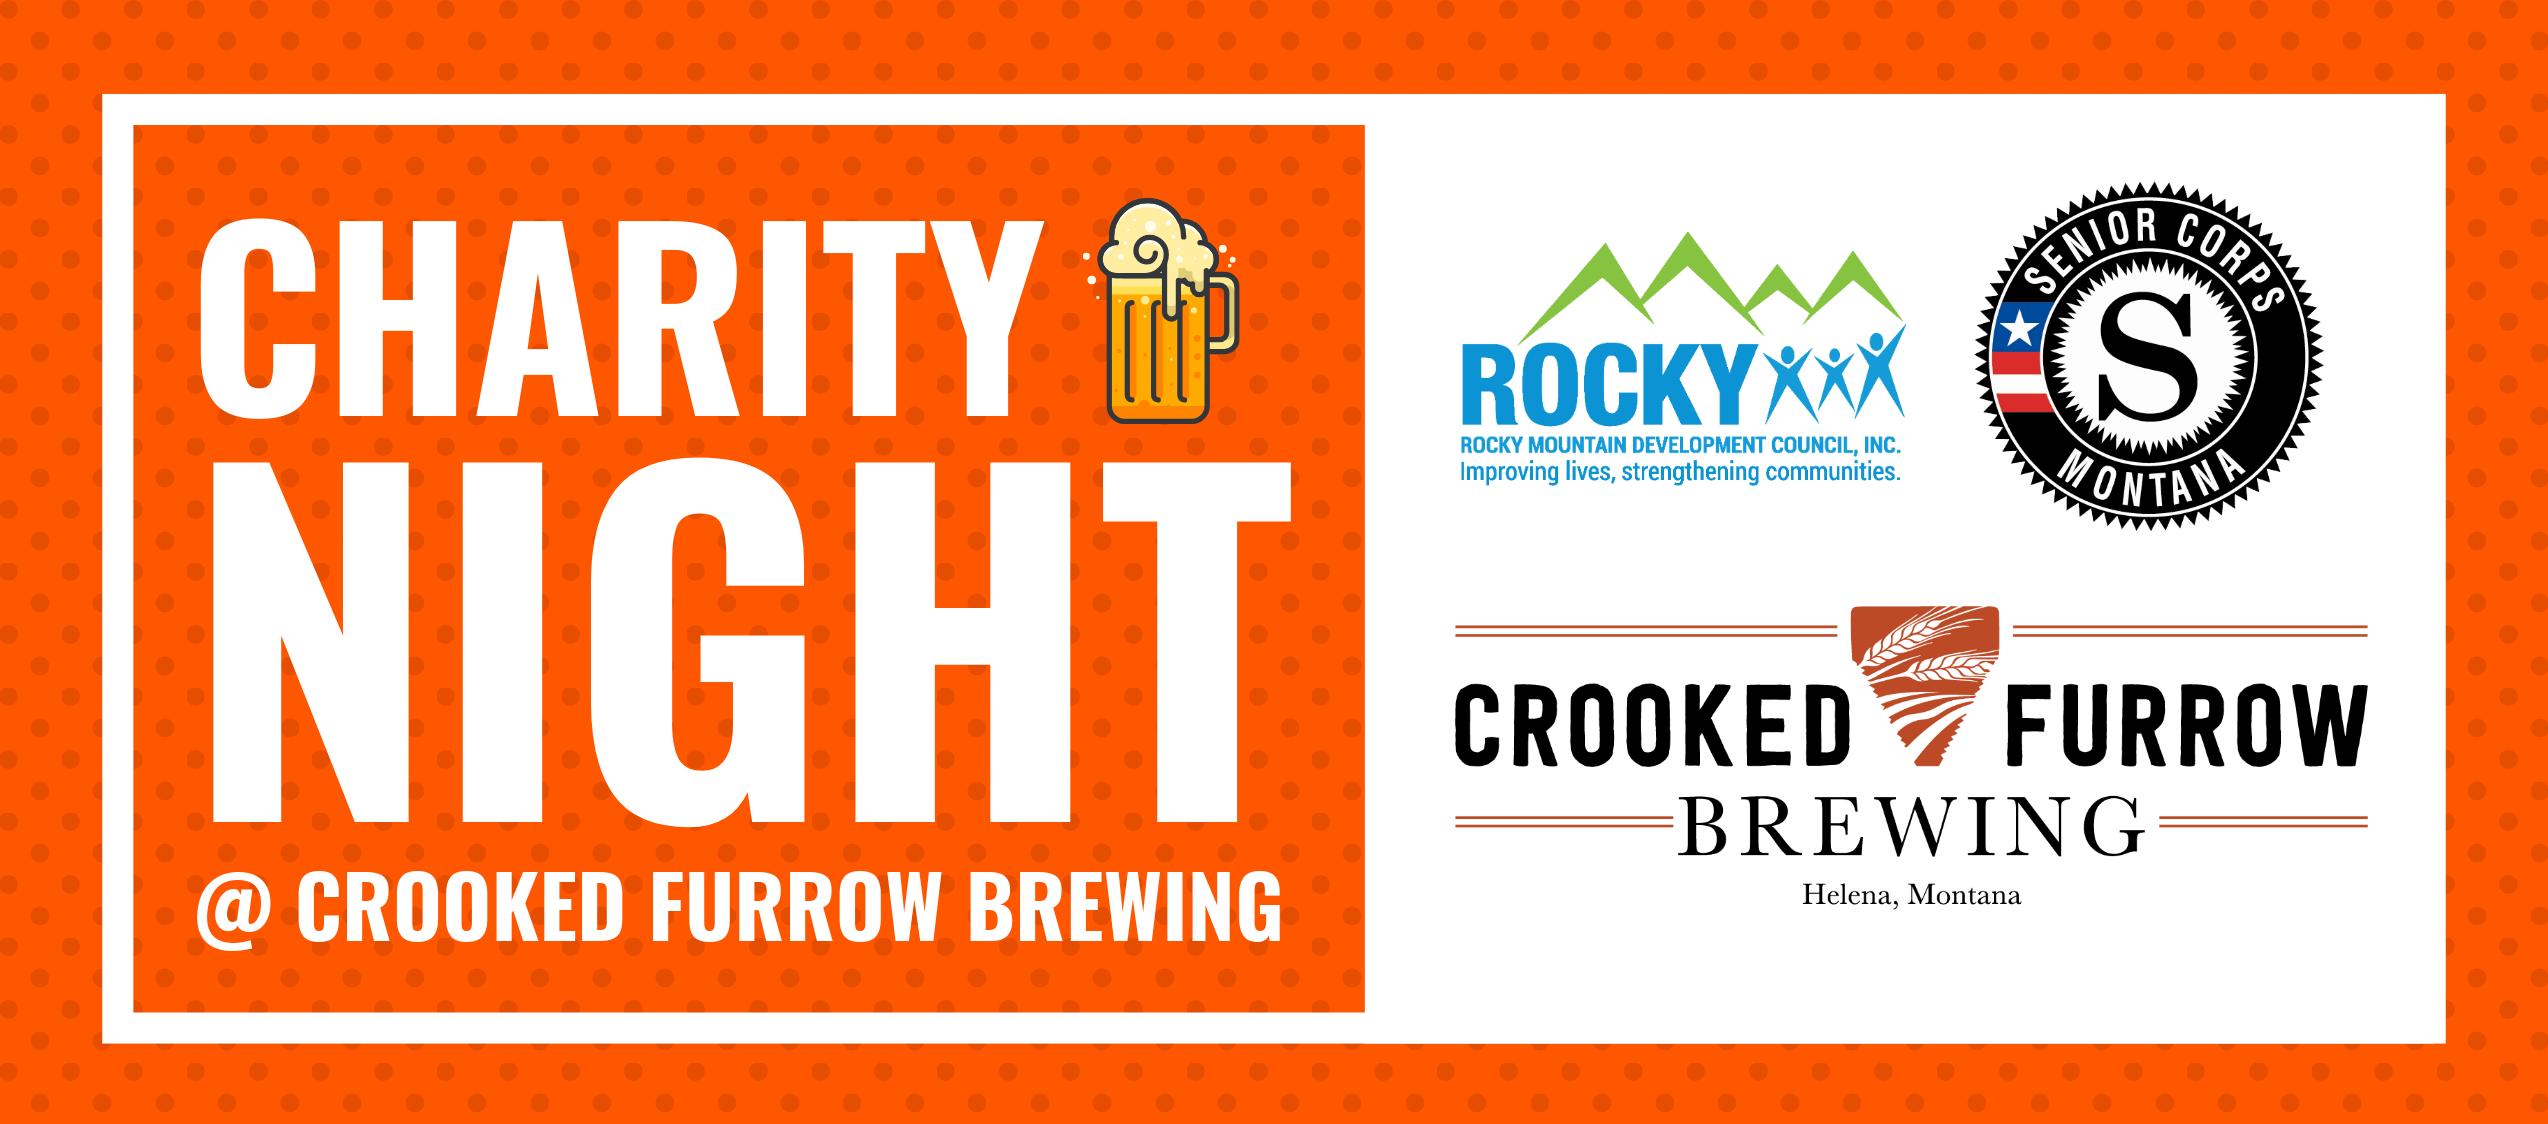 Senior Corps Charity Night at Crooked Furrow Brewing